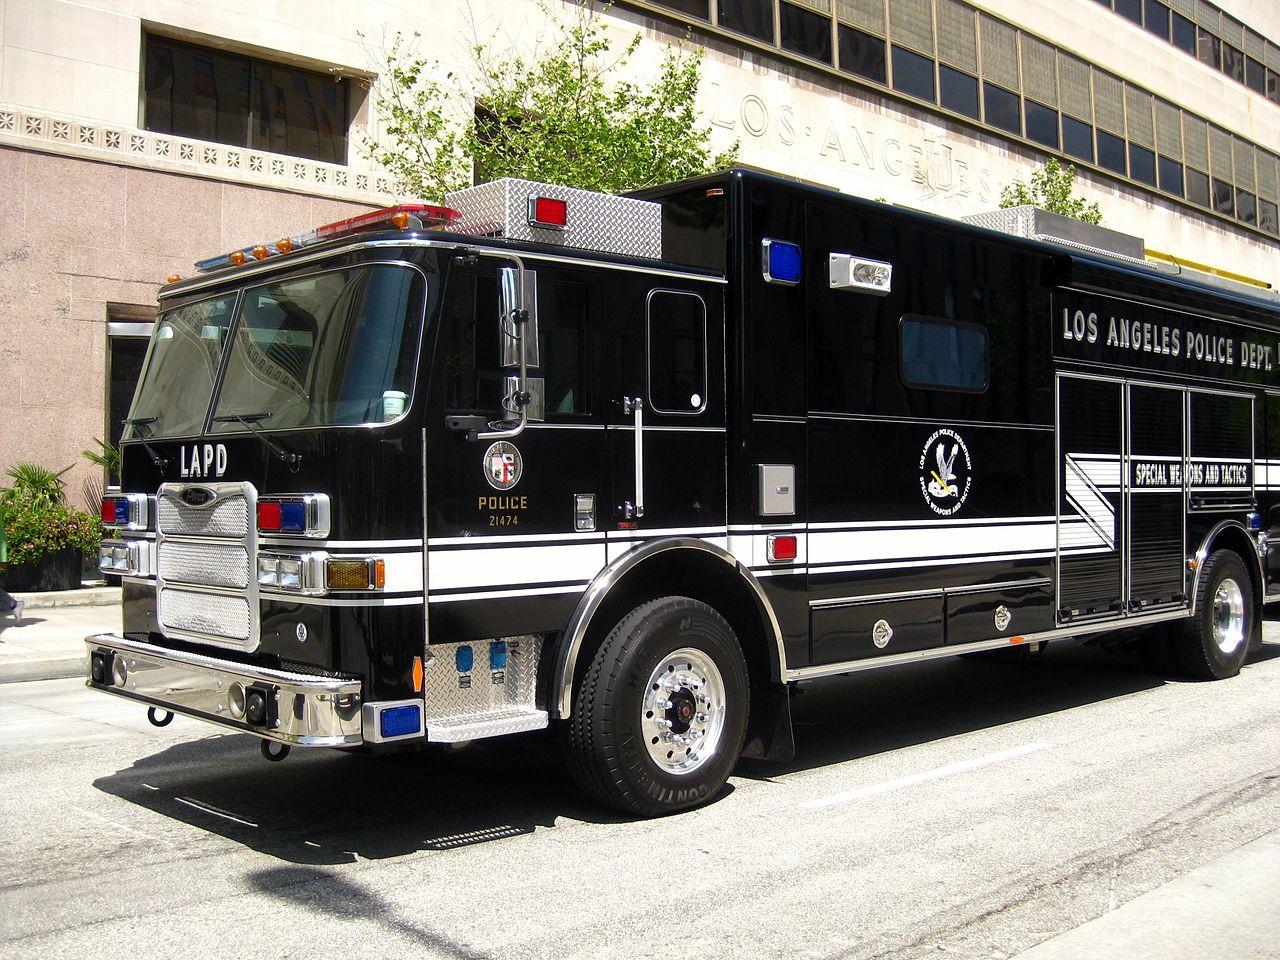 Truck Accessories Florida >> File:LAPD SWAT truck - 1.jpg - Wikipedia